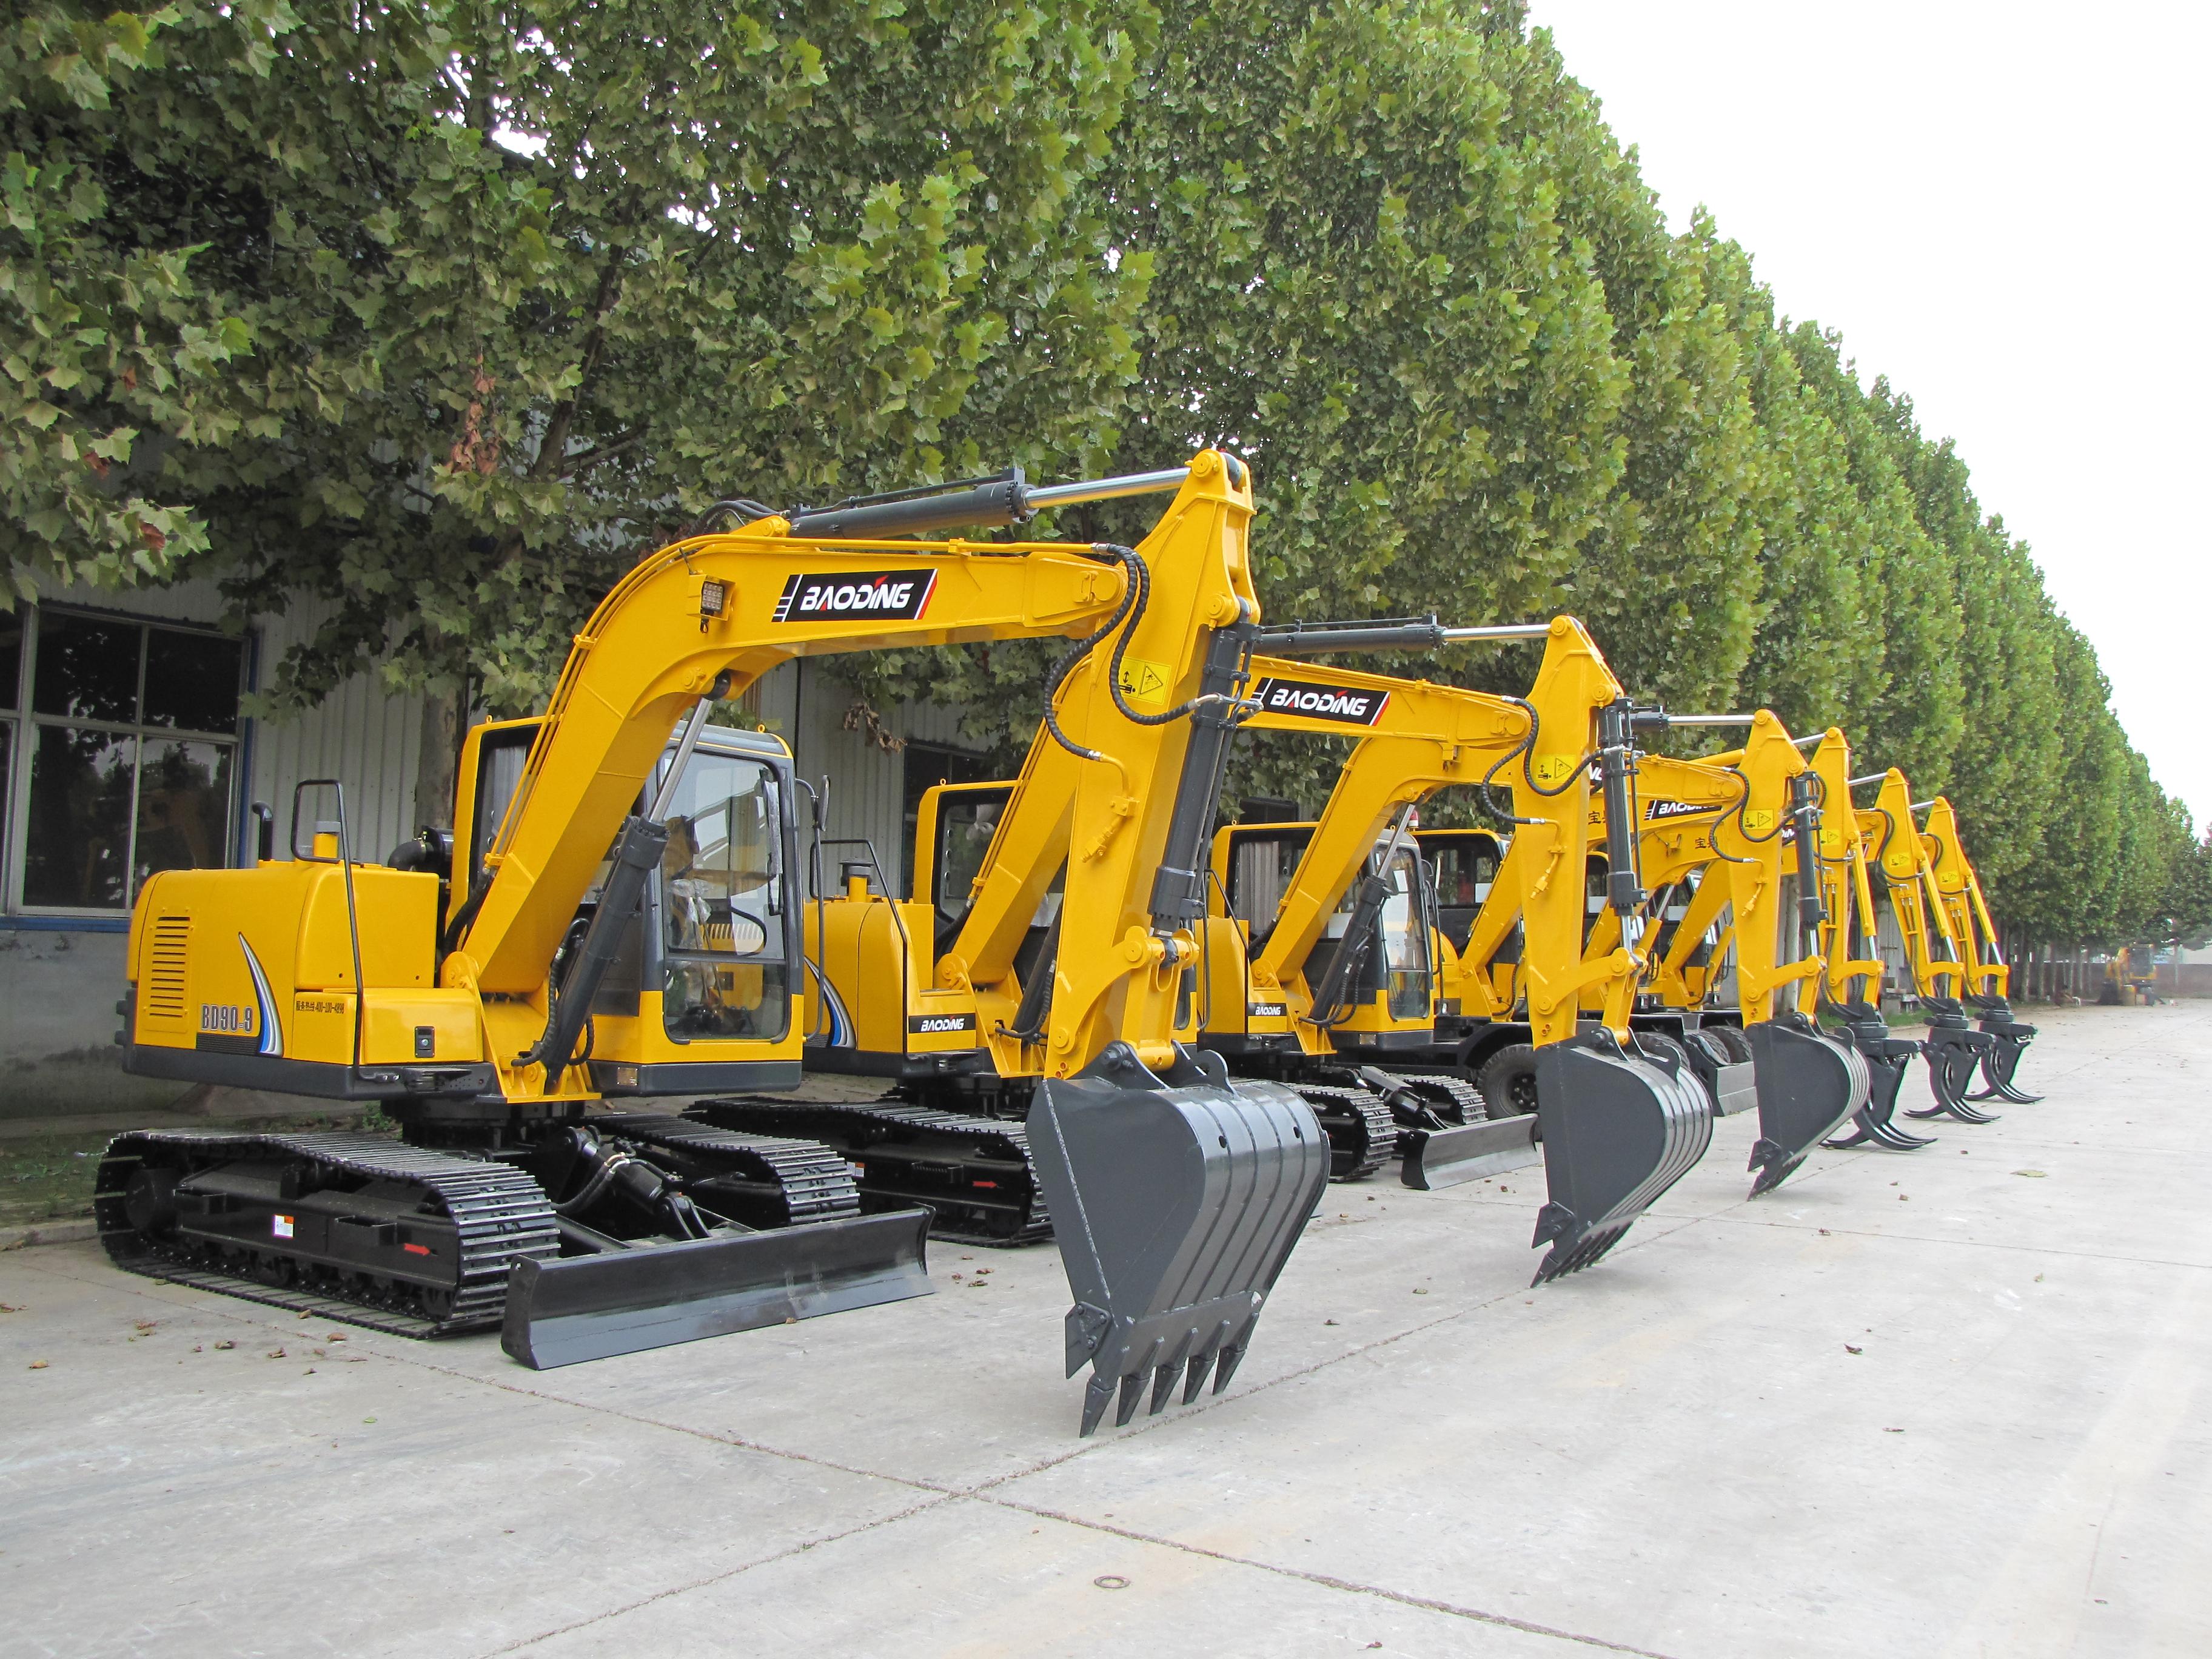 Dezhou Baoding Hydraulic Machinery Co., Ltd. Main Image